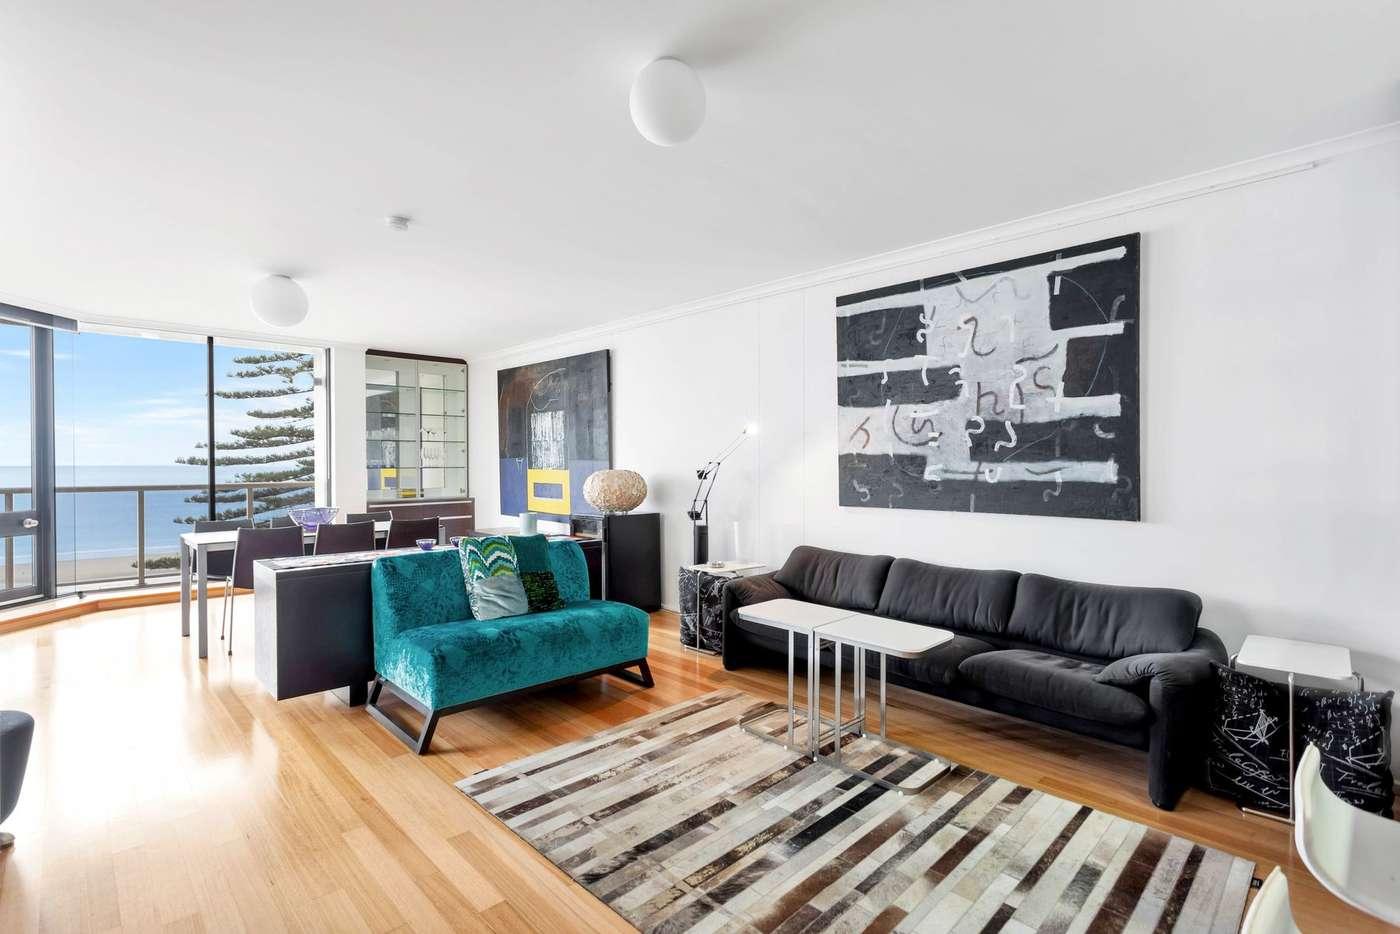 Main view of Homely apartment listing, 12/18 South Esplanade, Glenelg SA 5045